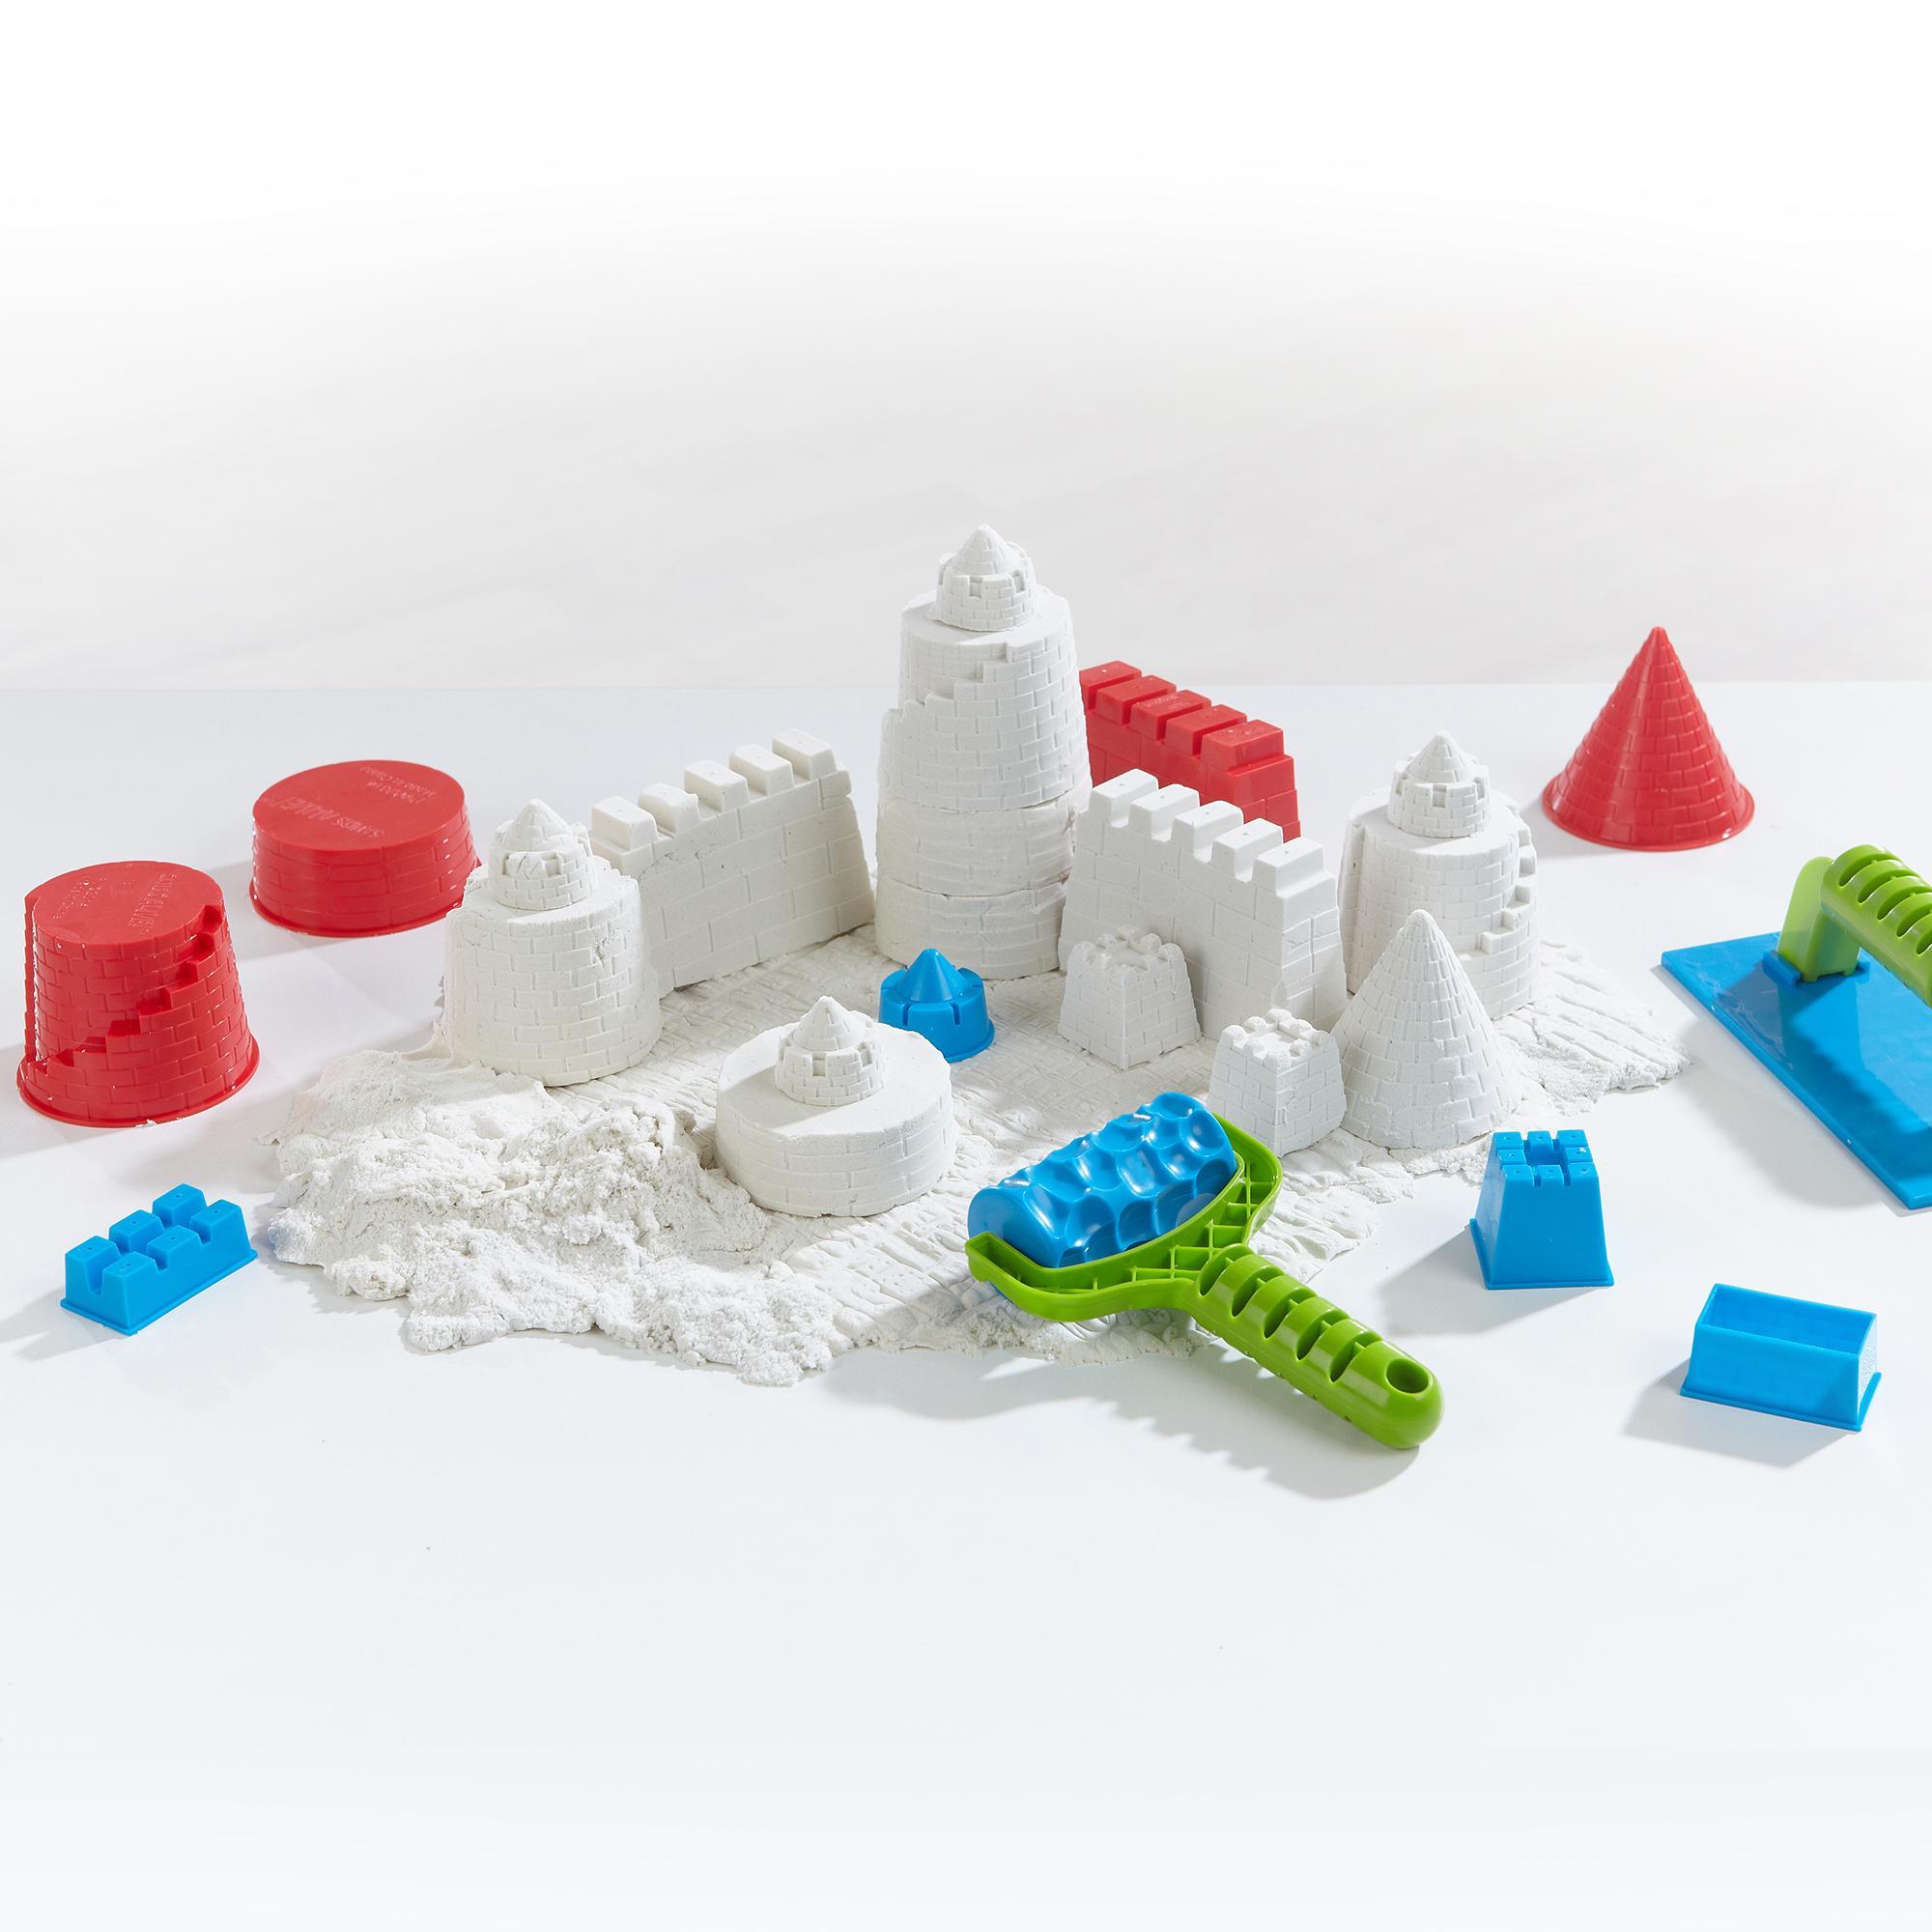 Goliath 83219 - Super-Sand-Set Castle, modellierbarer